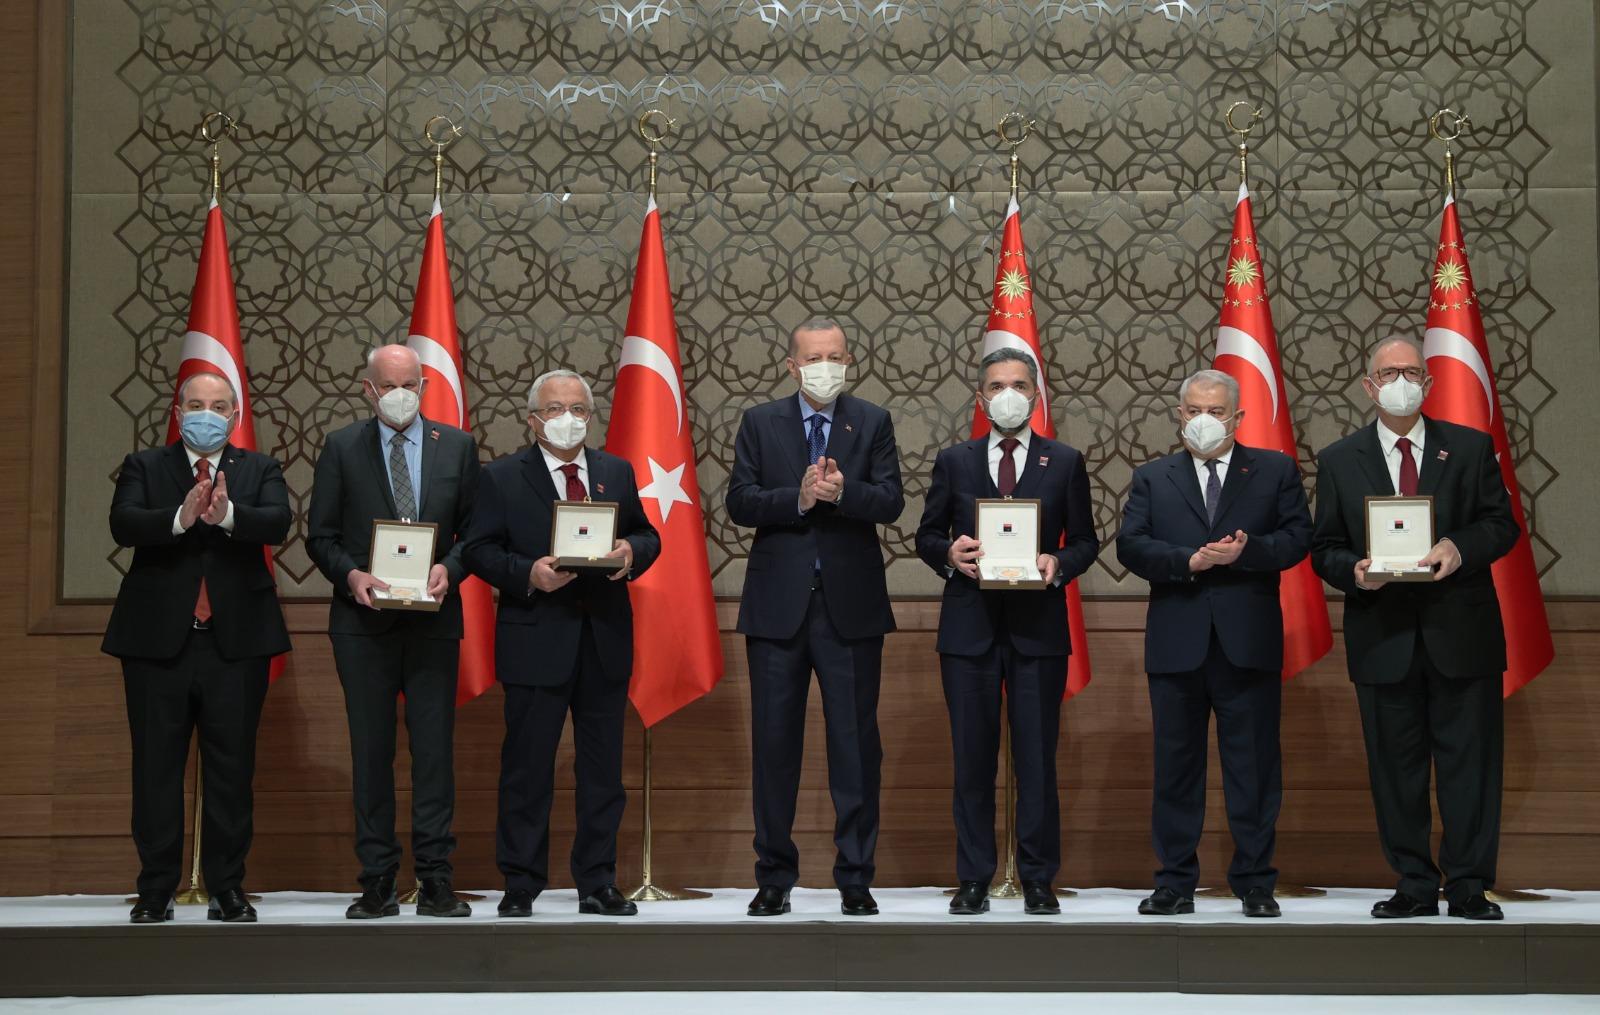 Tuba prize at presidential palace in Ankara